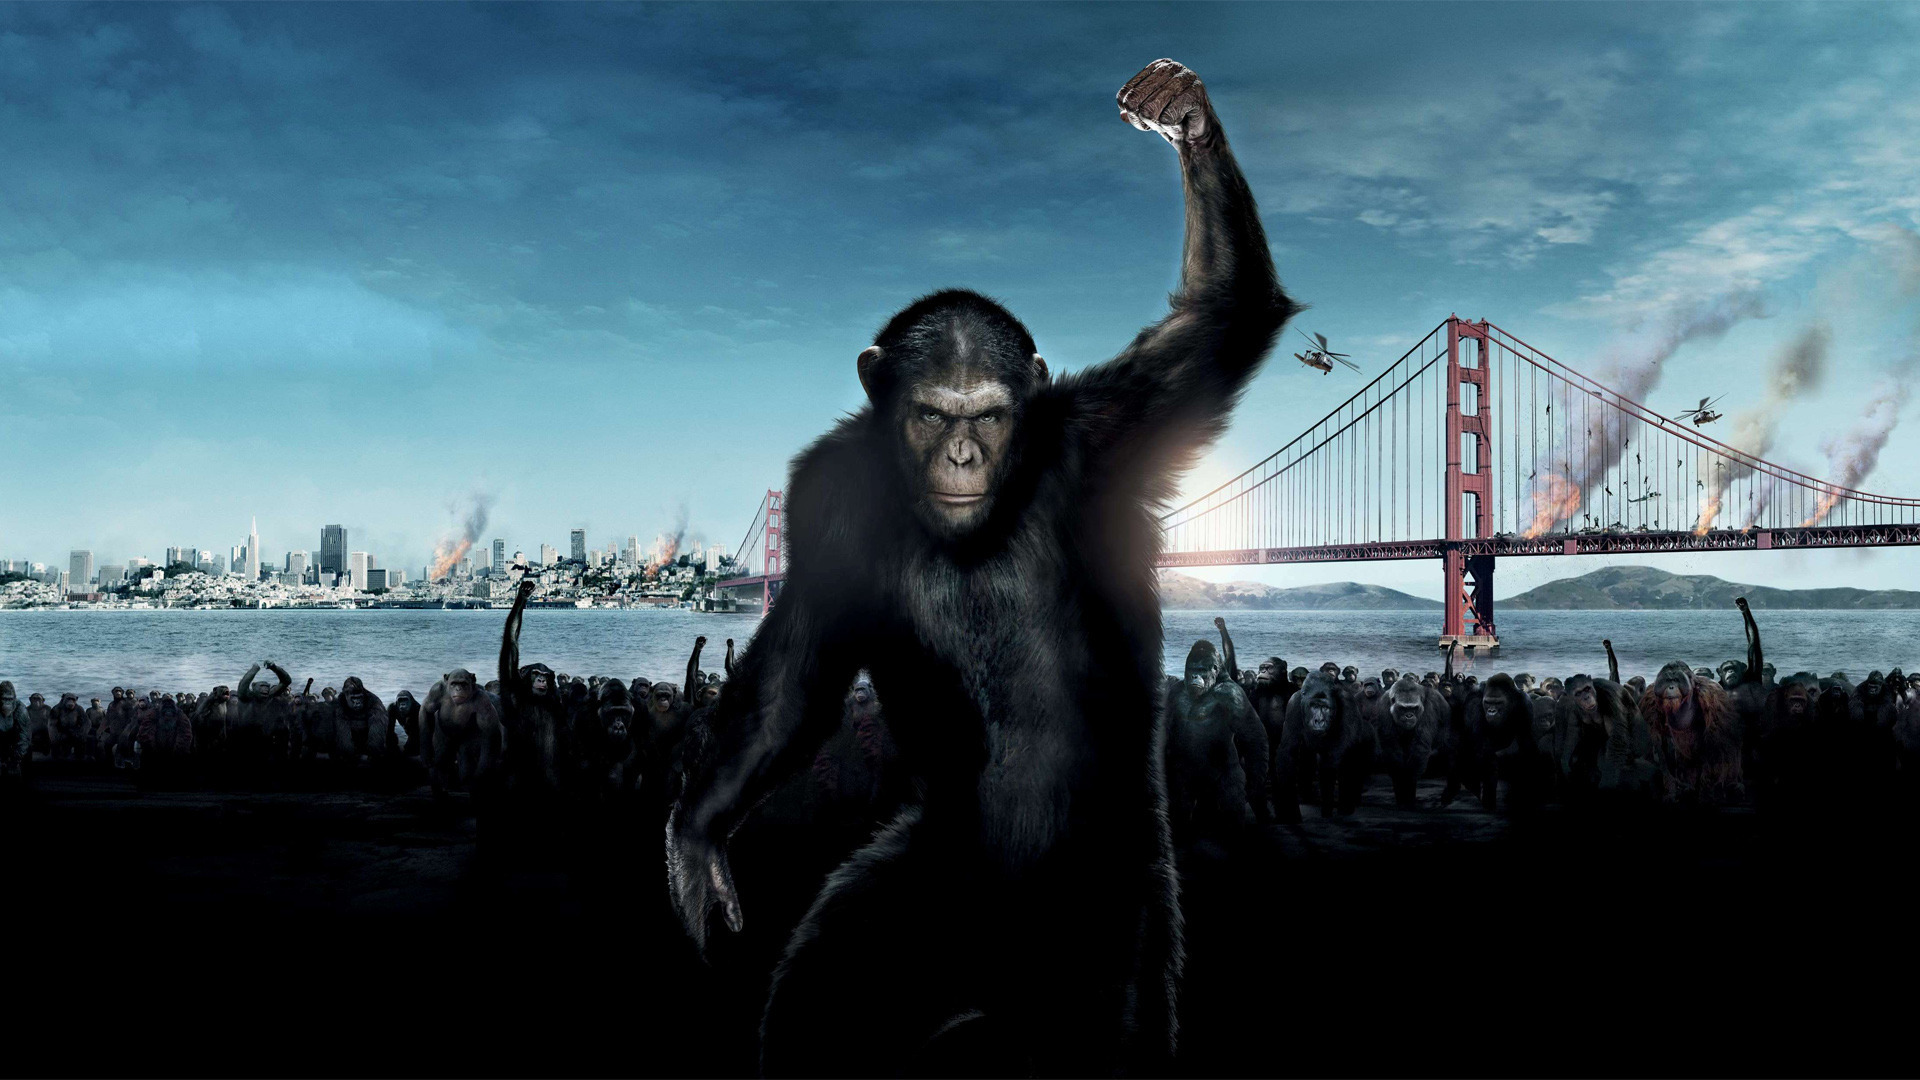 50 Planet Of The Apes Wallpaper On Wallpapersafari